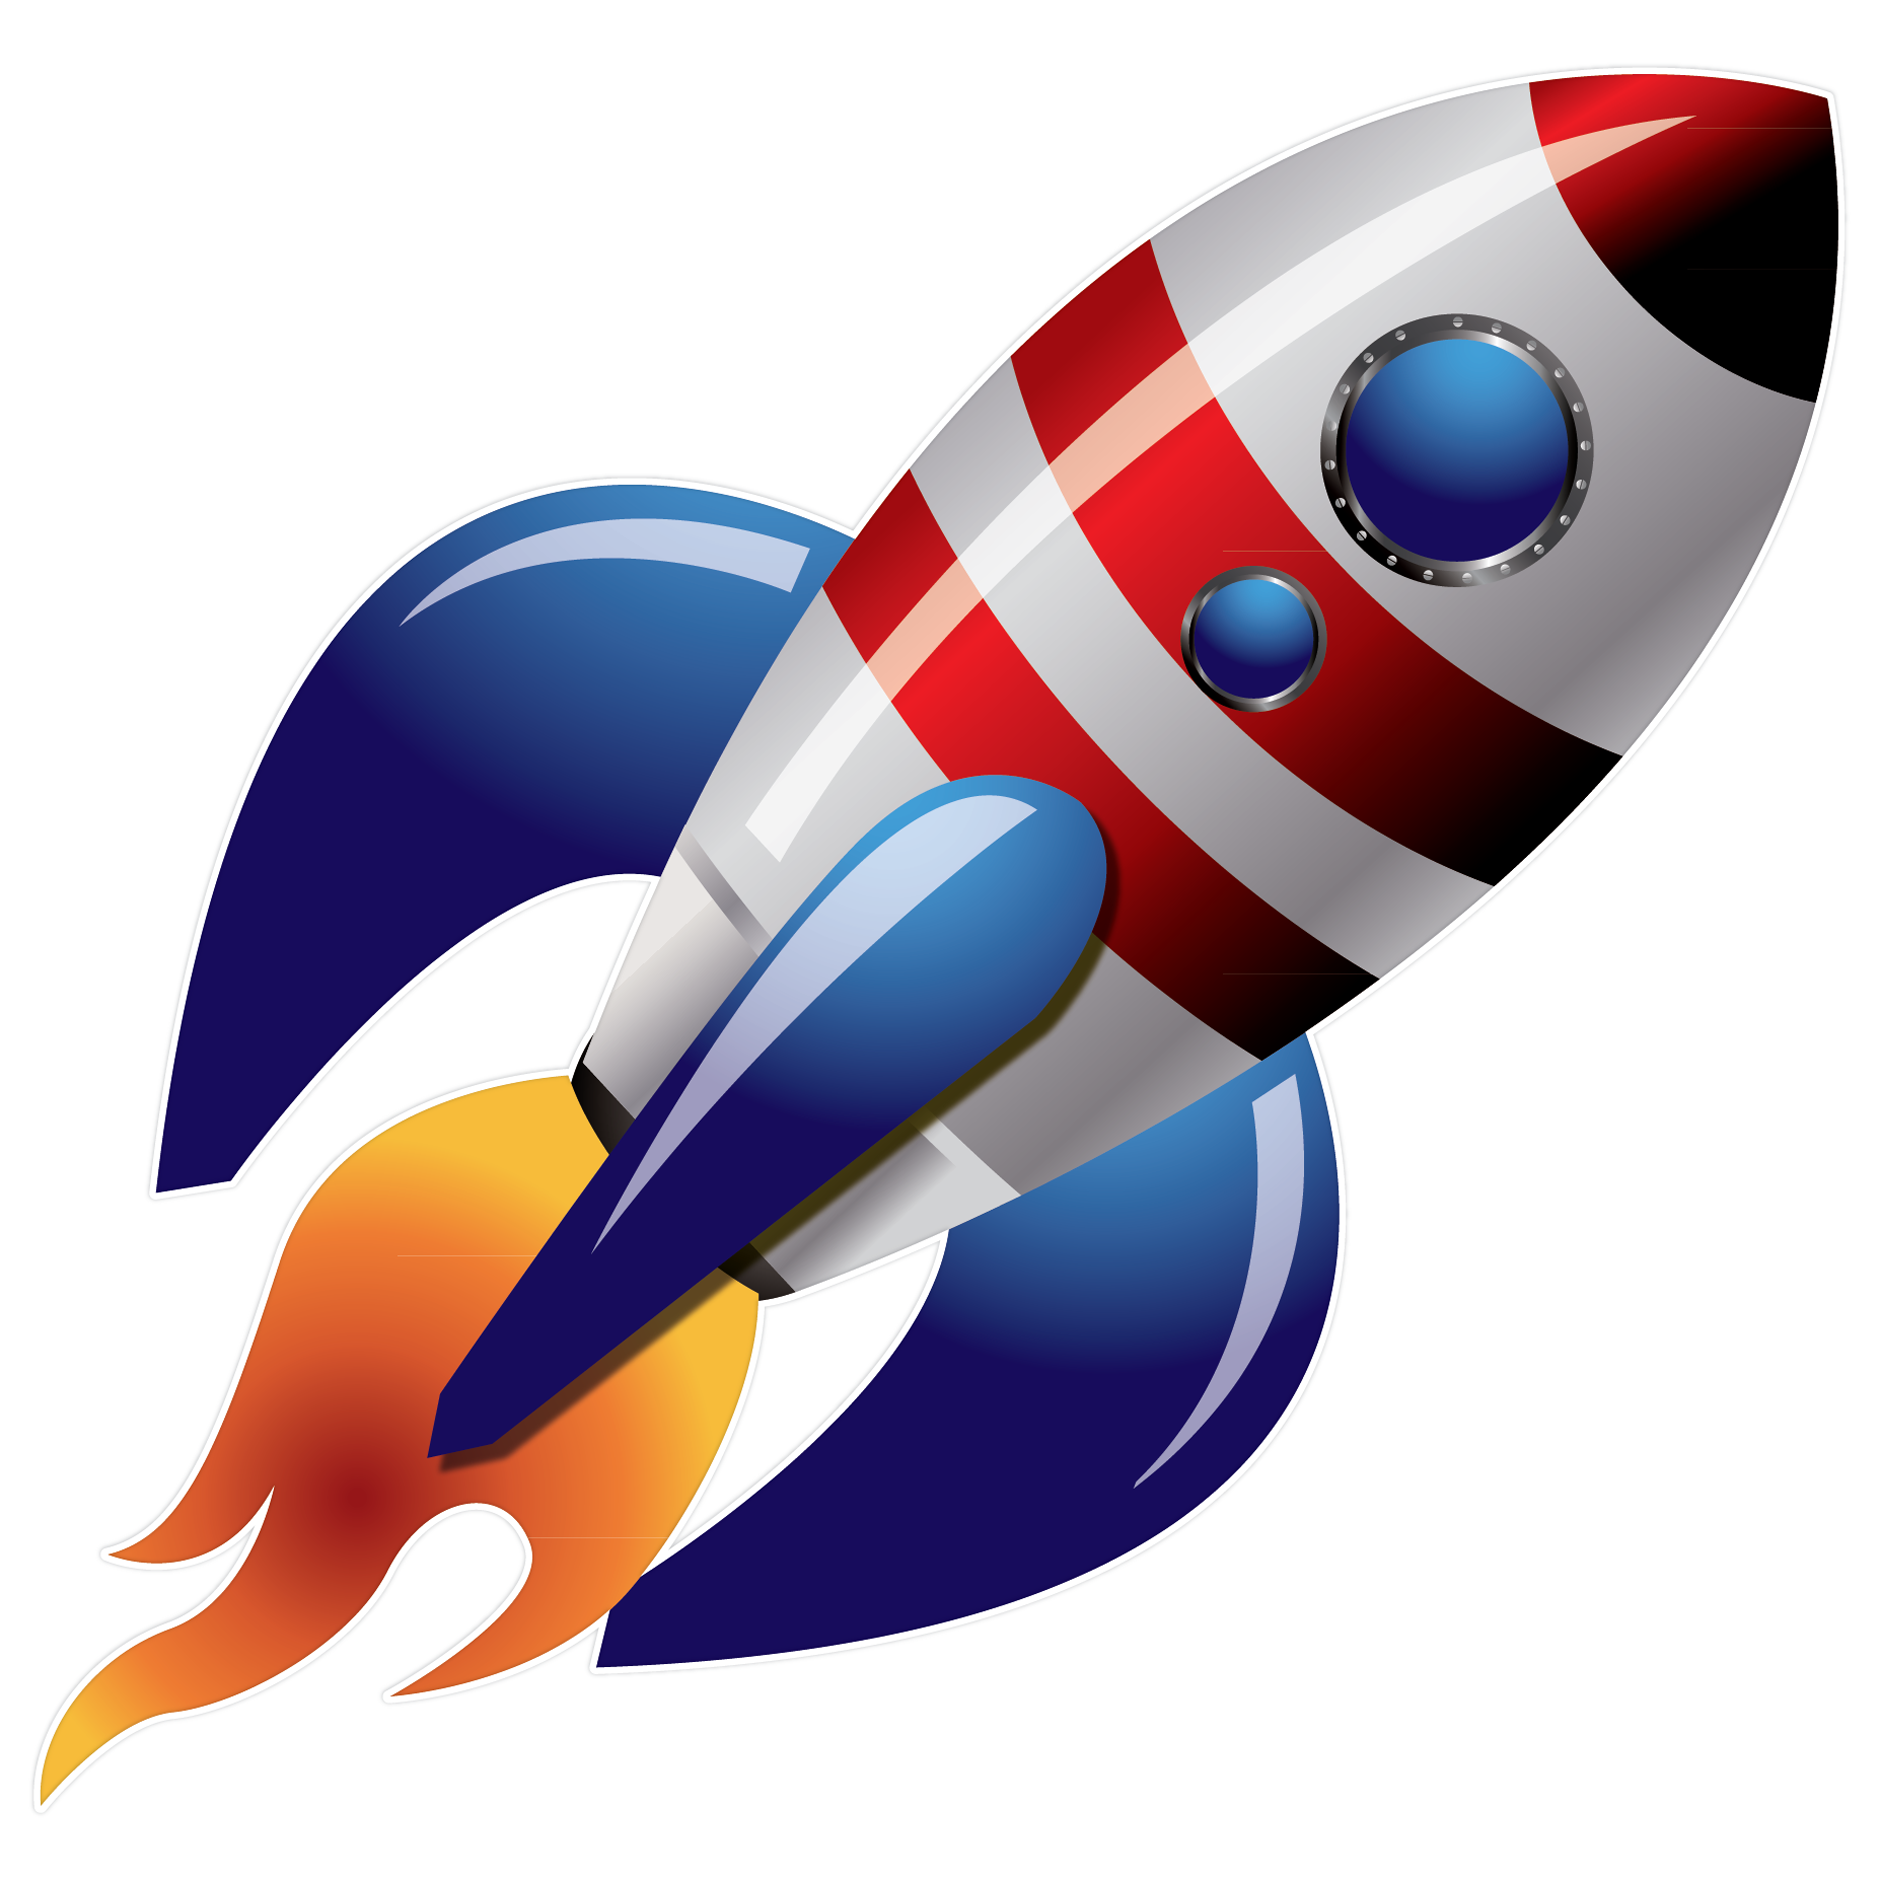 Rocket Ship PNG HD - 124230